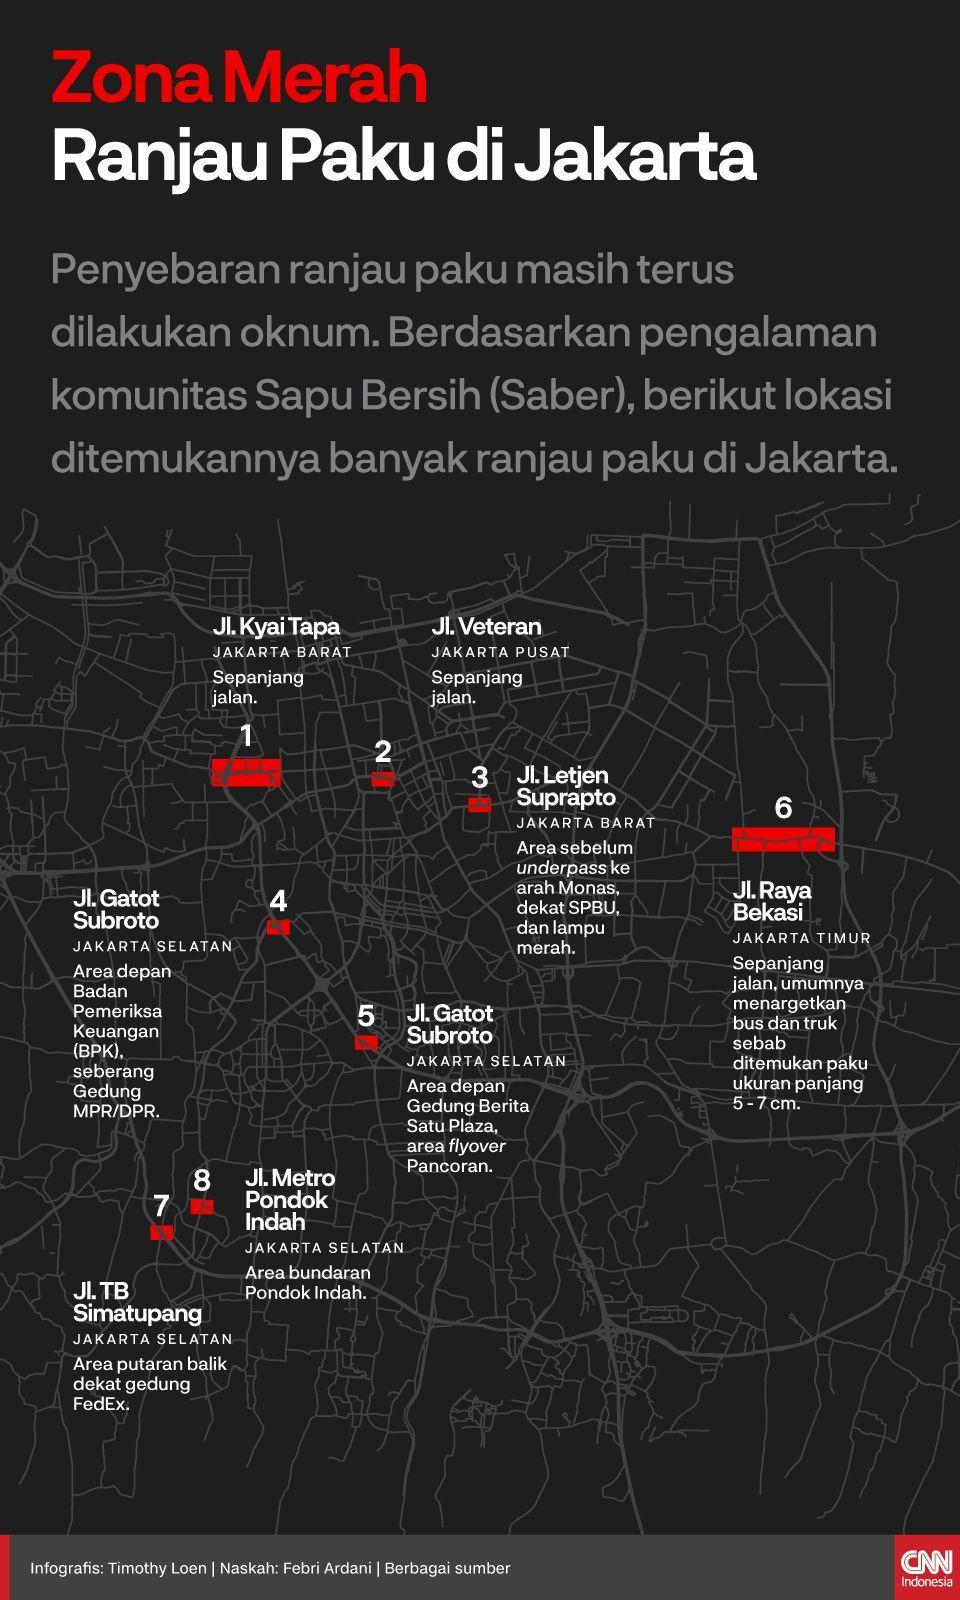 Infografis Zona Merah Ranjau Paku di Jakarta